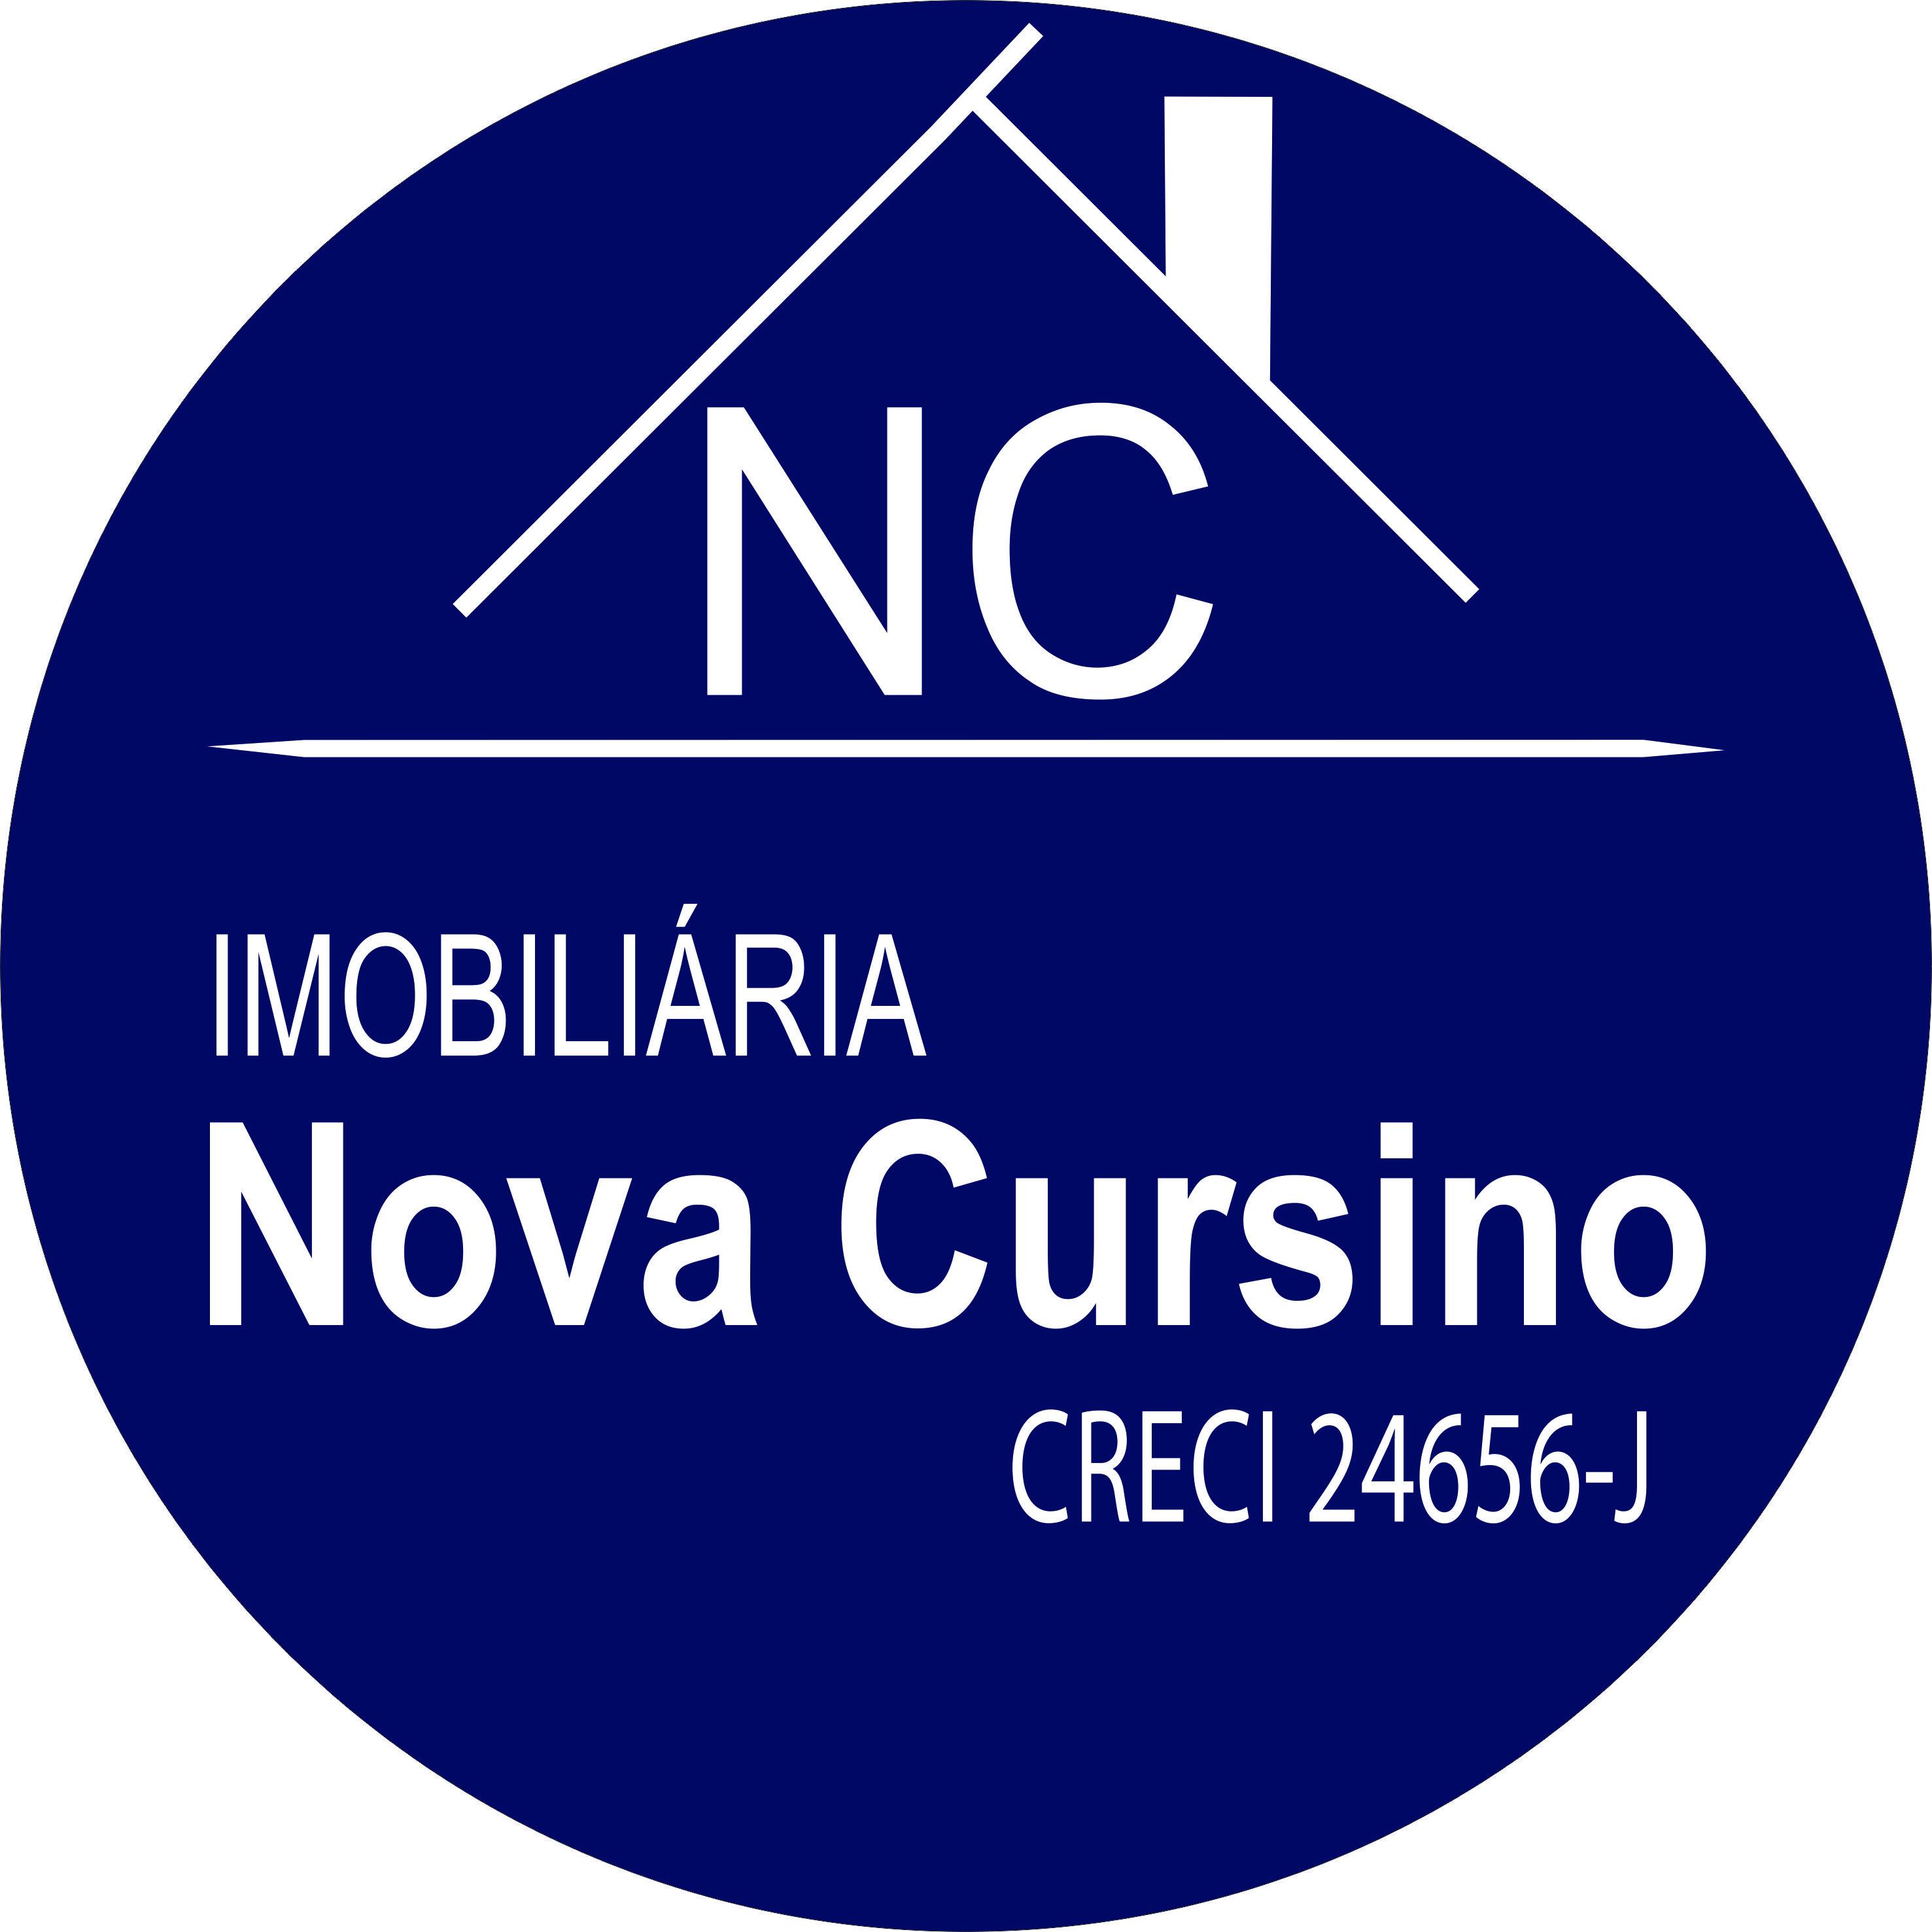 Imobilaria Nova Cursino